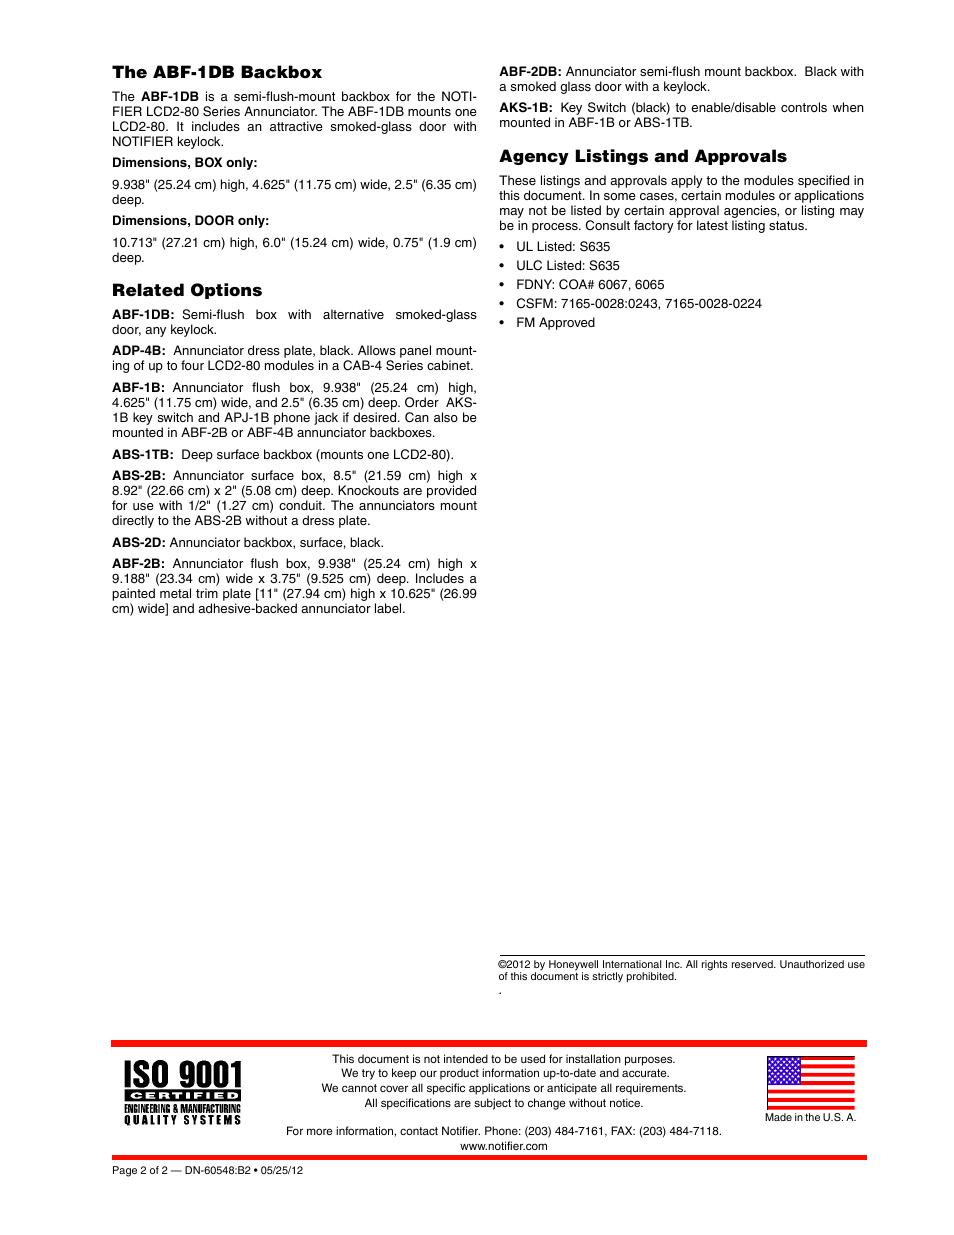 lcd 2 notifier manual how to and user guide instructions u2022 rh taxibermuda co Notifier AFP 200 Manual Notifier Parts